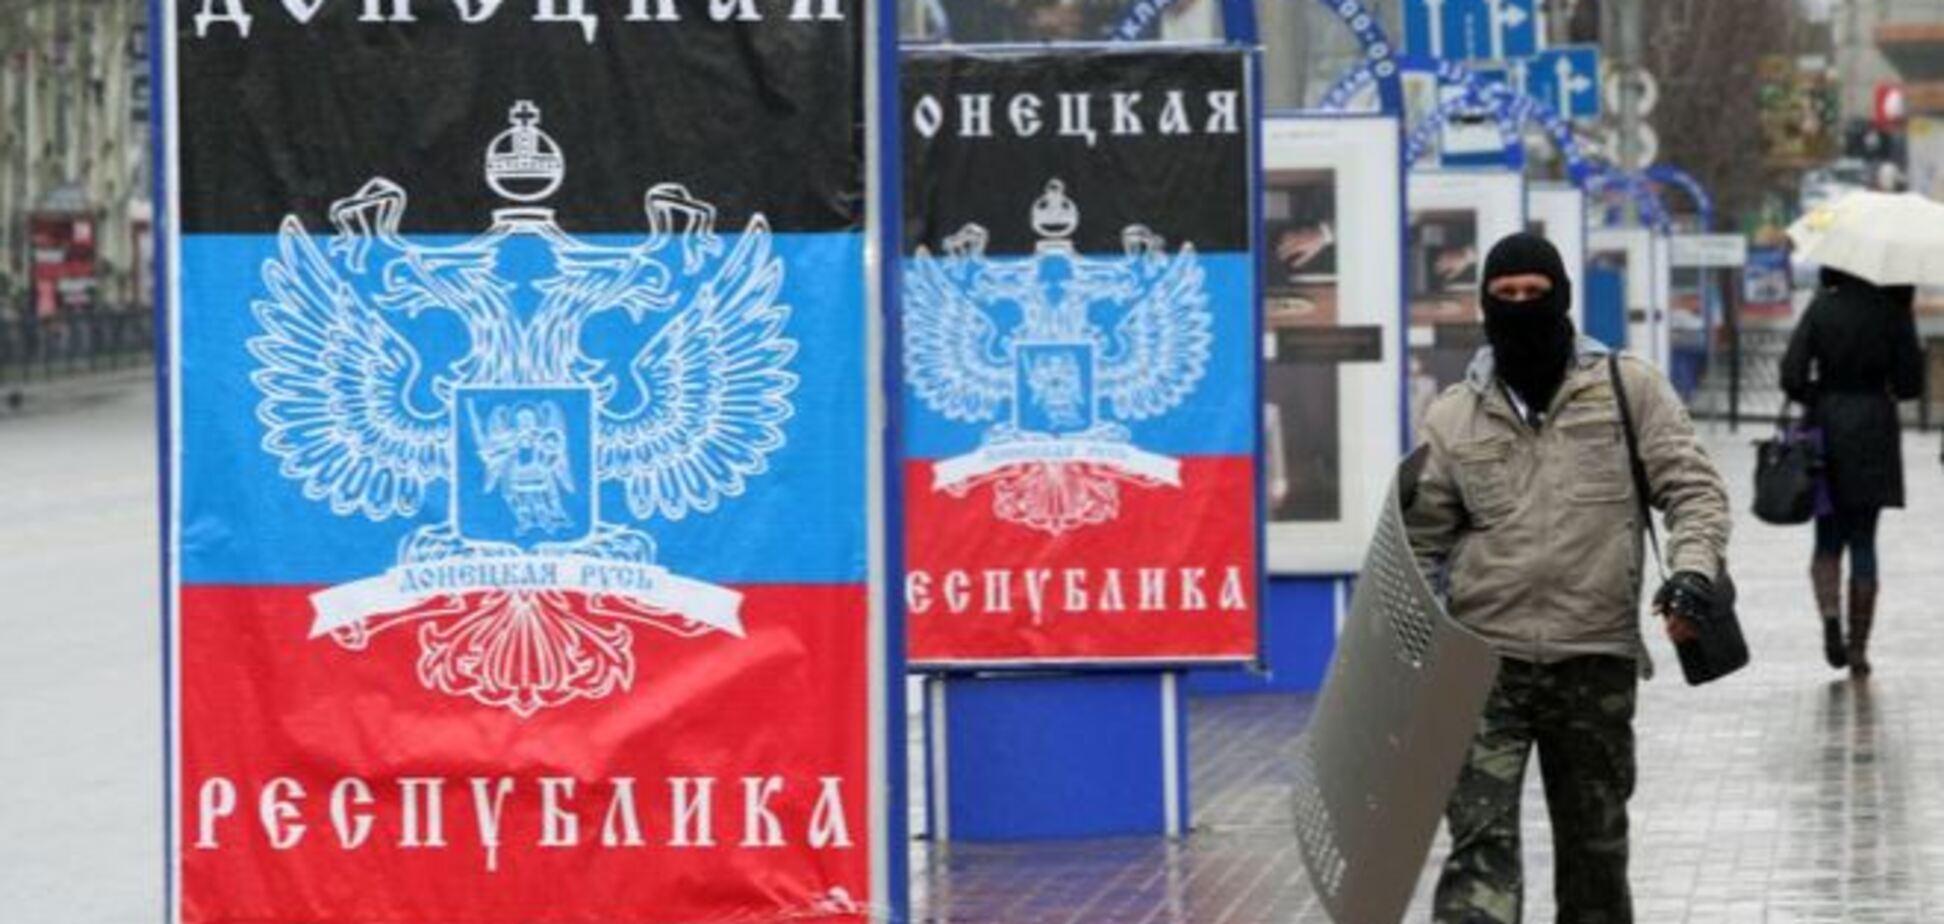 15 сотрудников прокуратуры Донецкой области перешли на сторону террористов 'ДНР'